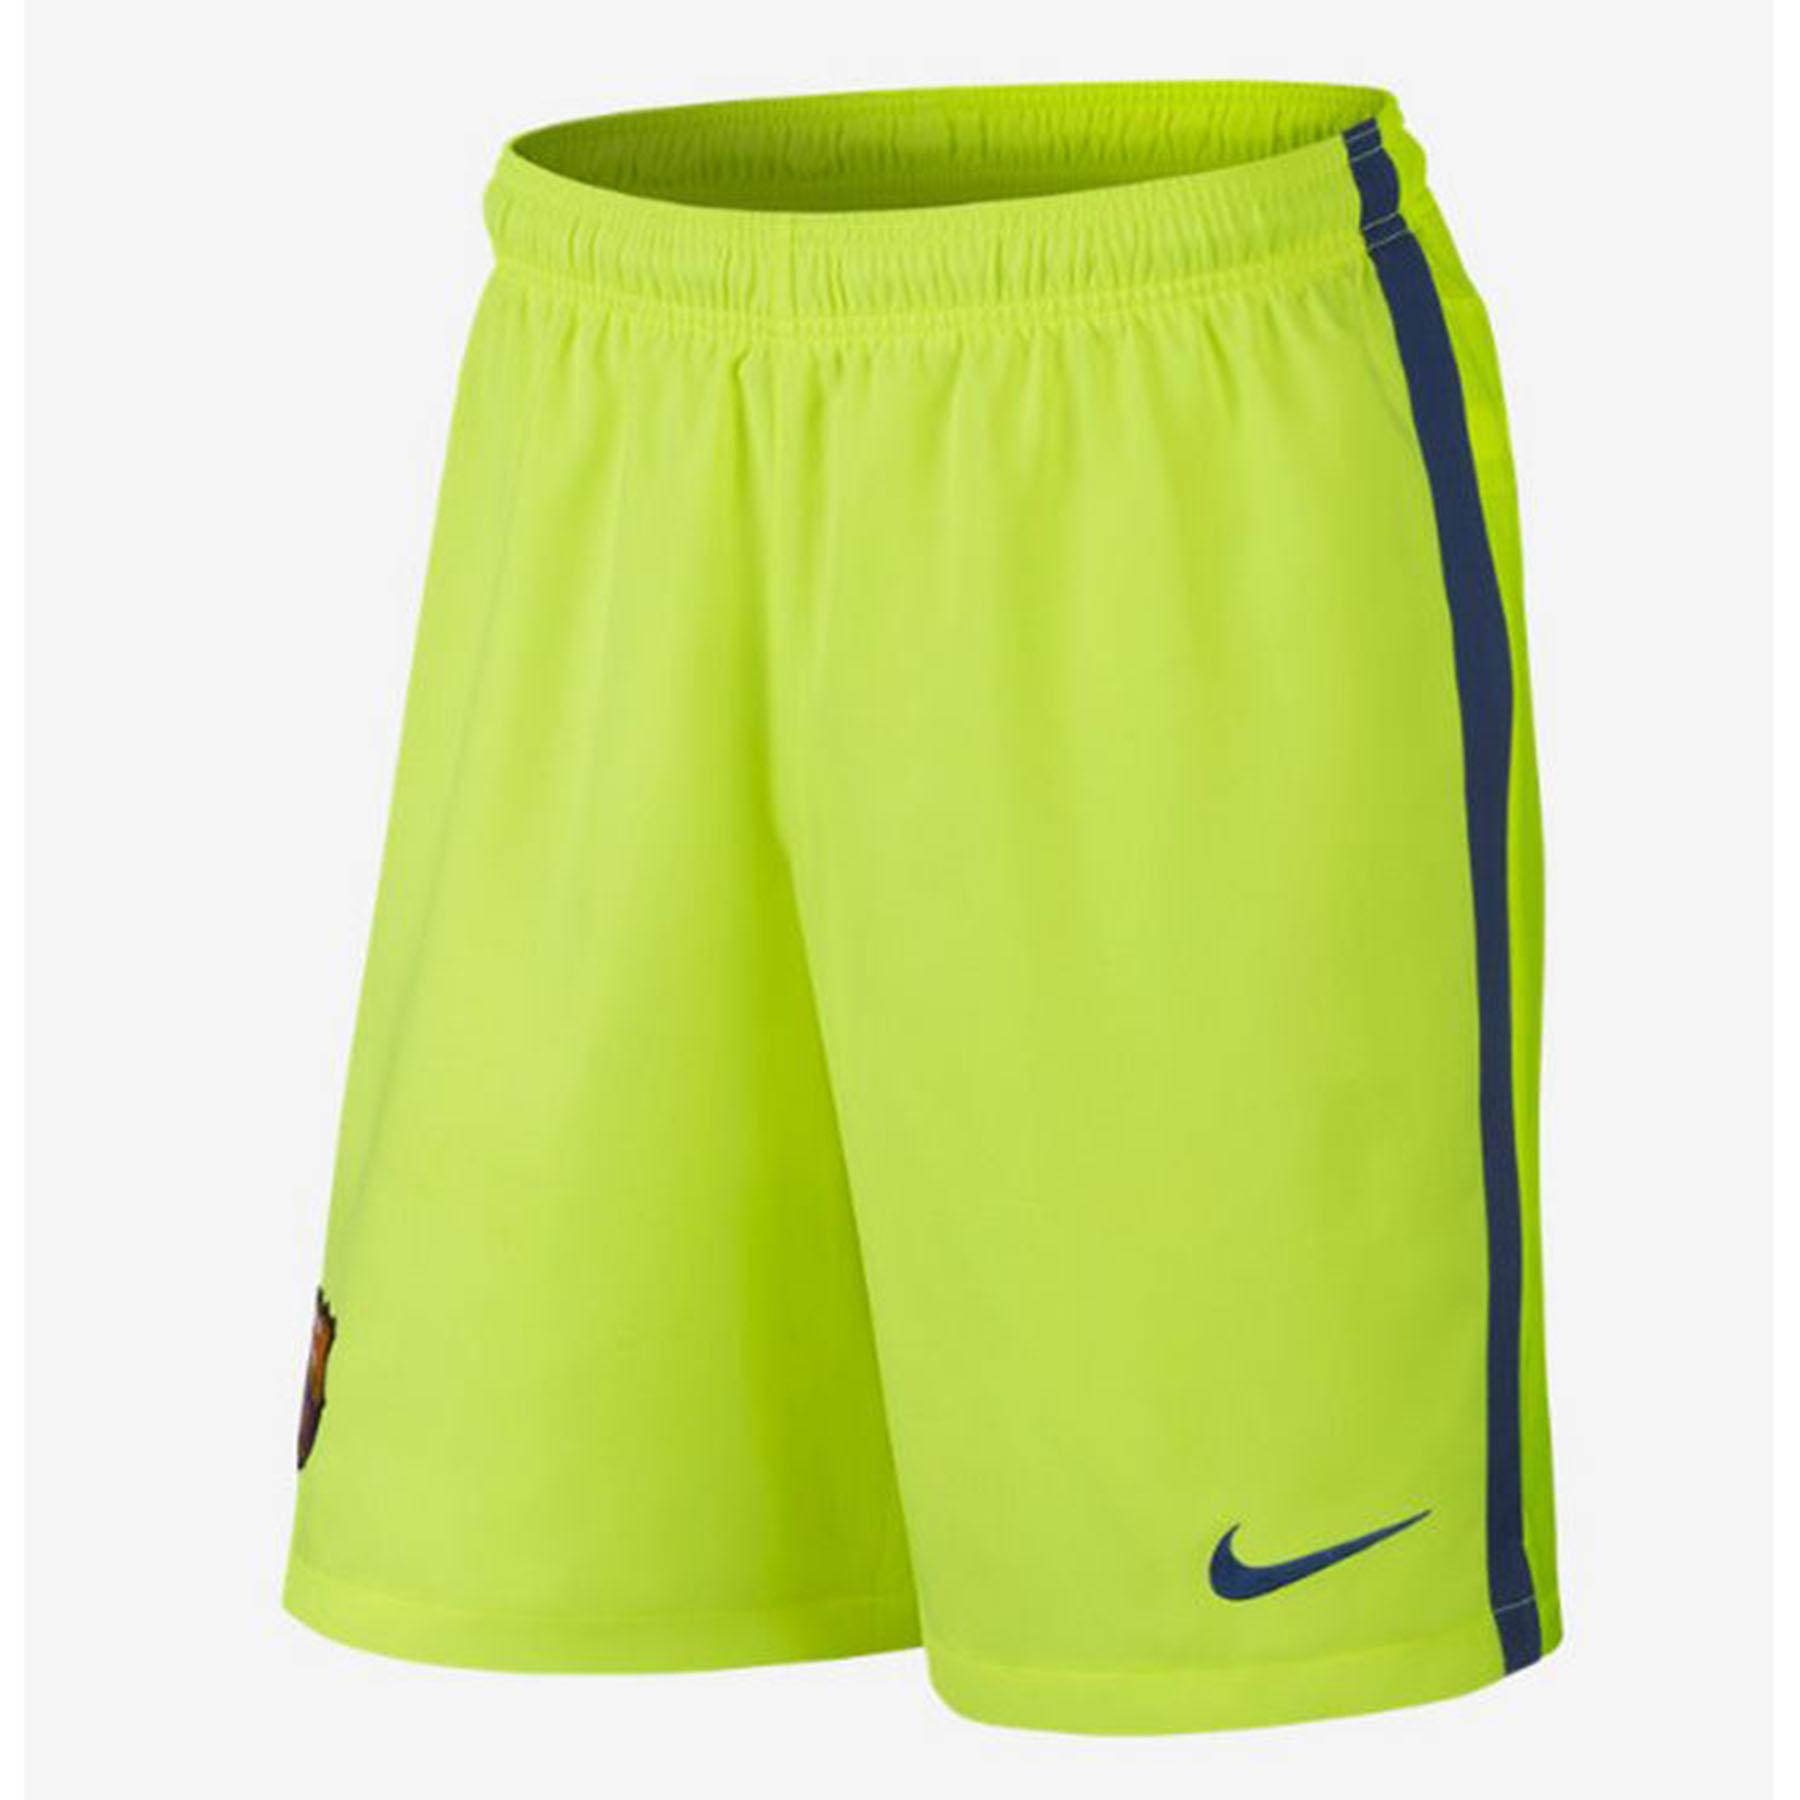 Barcelona Third Shorts 2014/15 Yellow